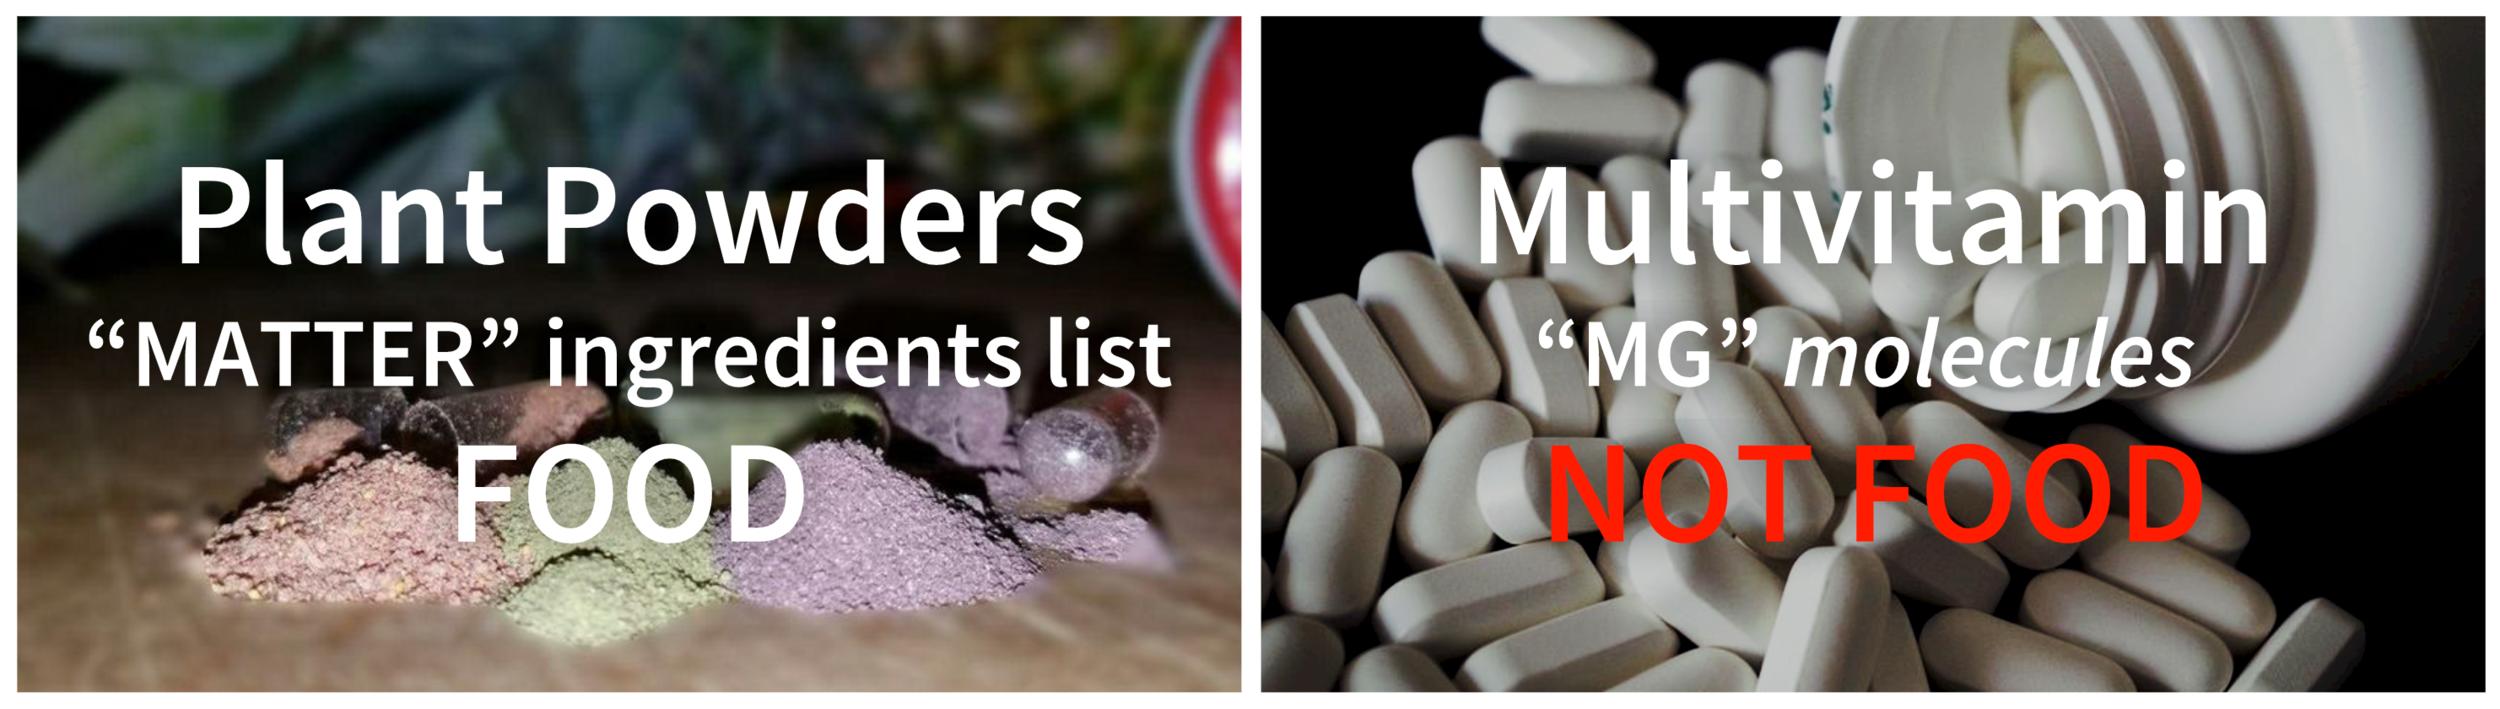 Plant Powders vs Multivitamin.PNG